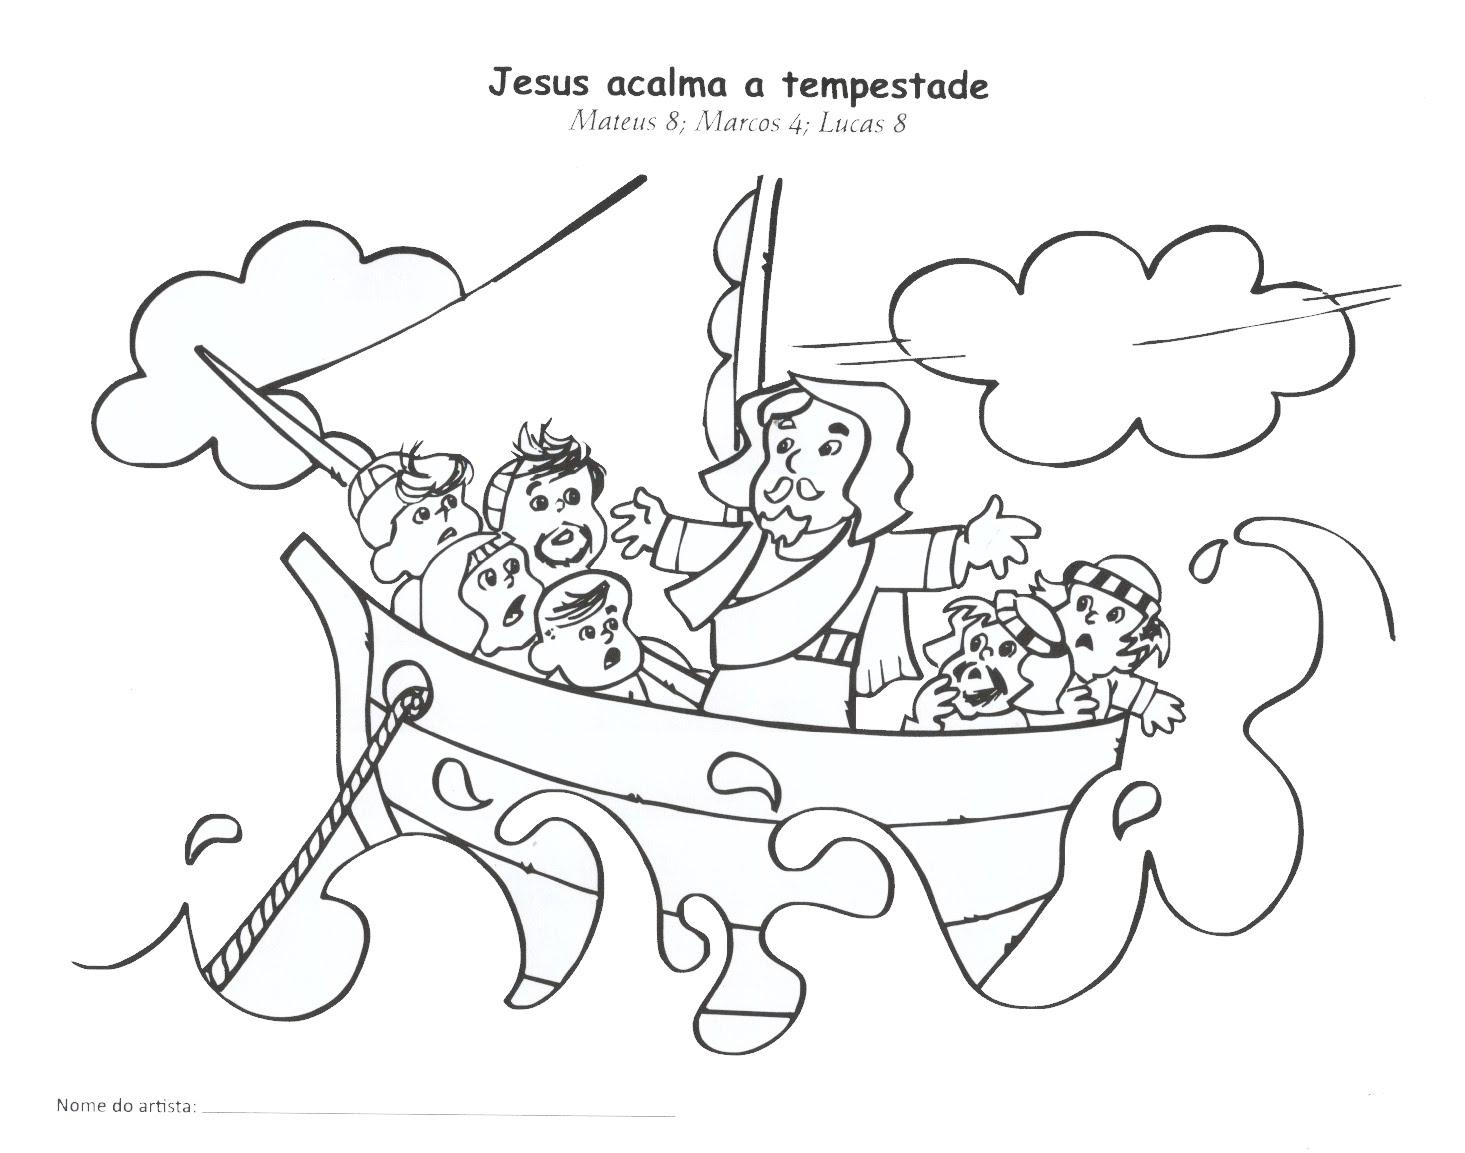 imagens para colorir jesus acalma a tempestade - Desenho de Jesus acalma a tempestade para colorir